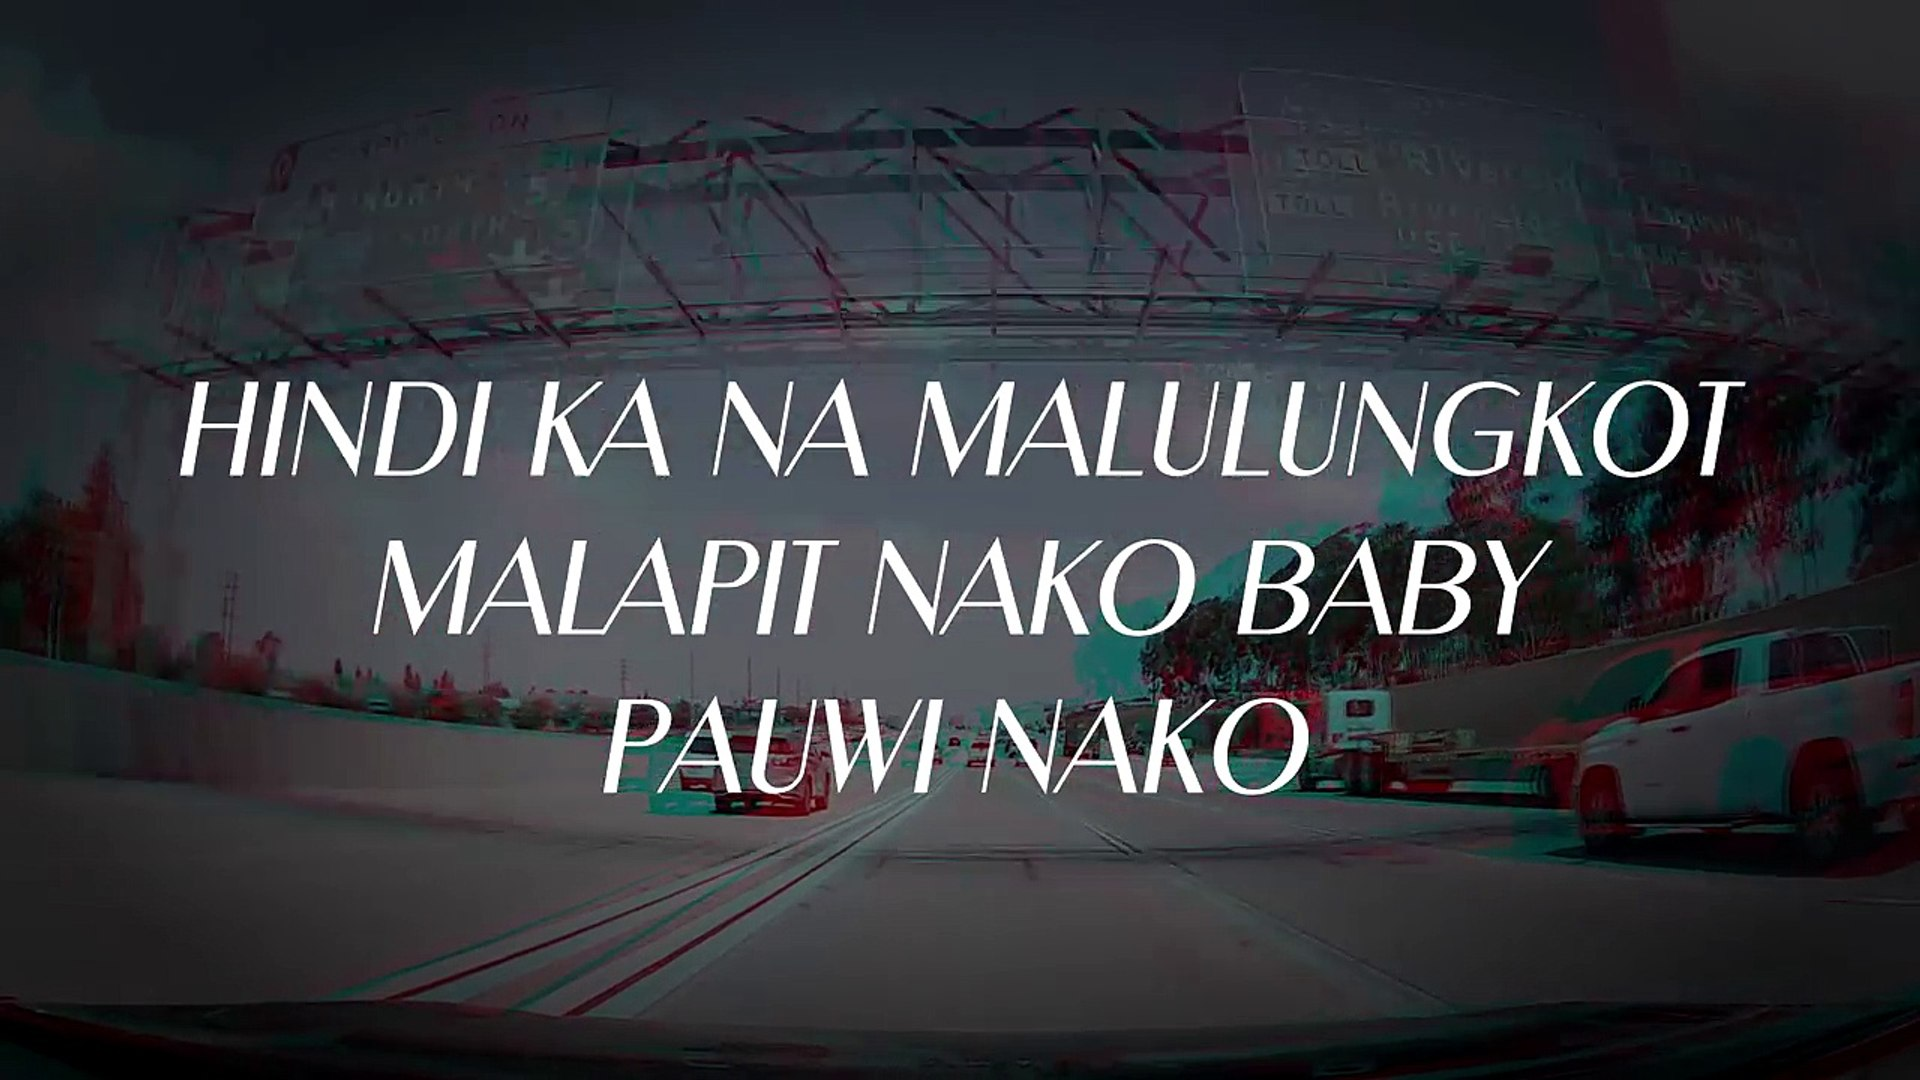 PAUWI NAKO - O.C. Dawgs ft. Yuri Dope, Flow-G (LYRIC VIDEO)